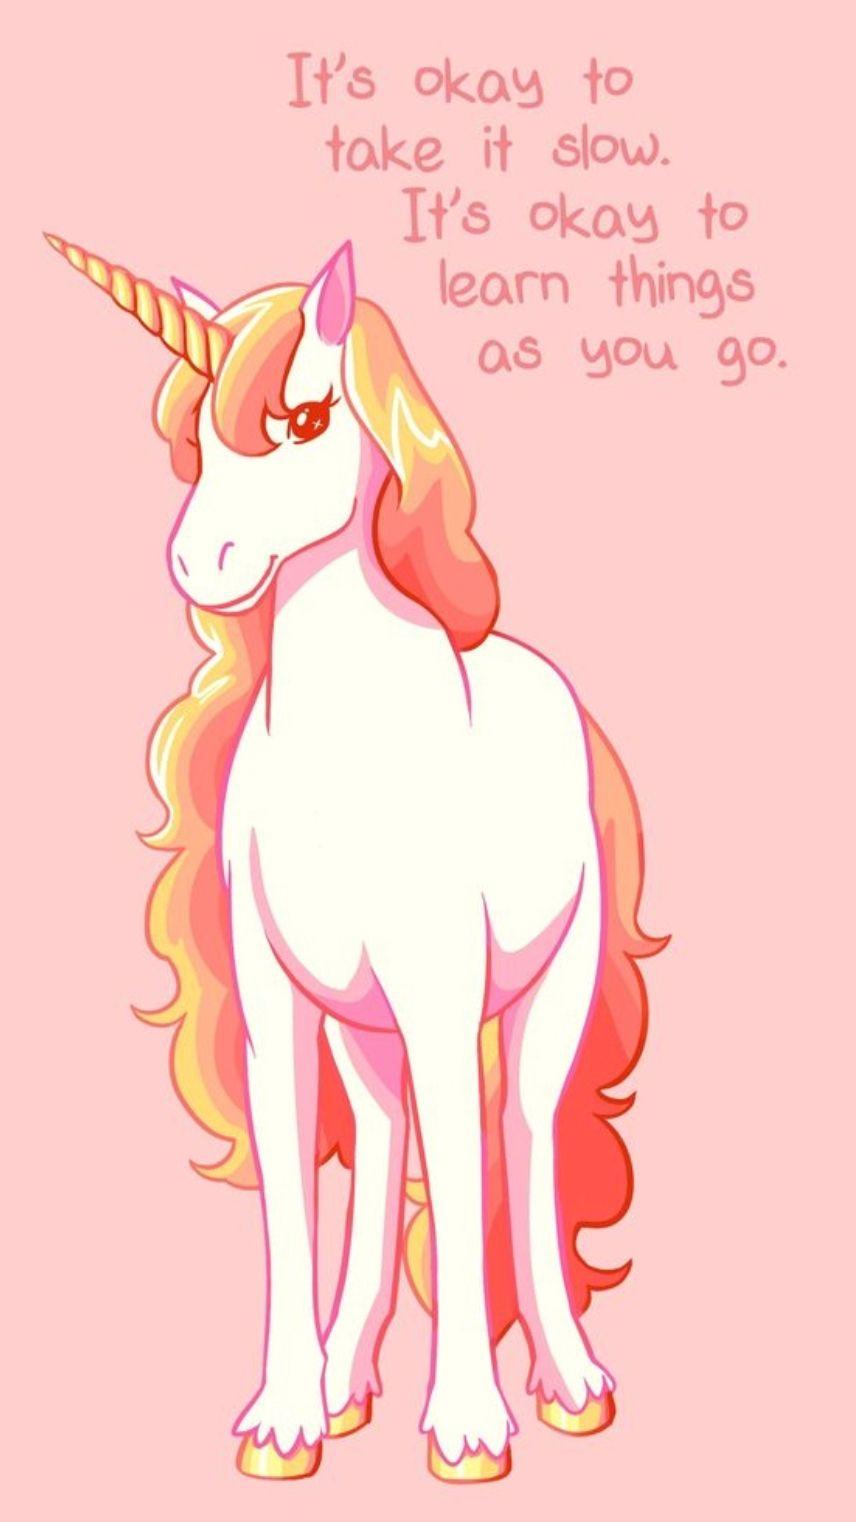 Unicorn  Inspirational animal quotes, Cute animal quotes, Animal